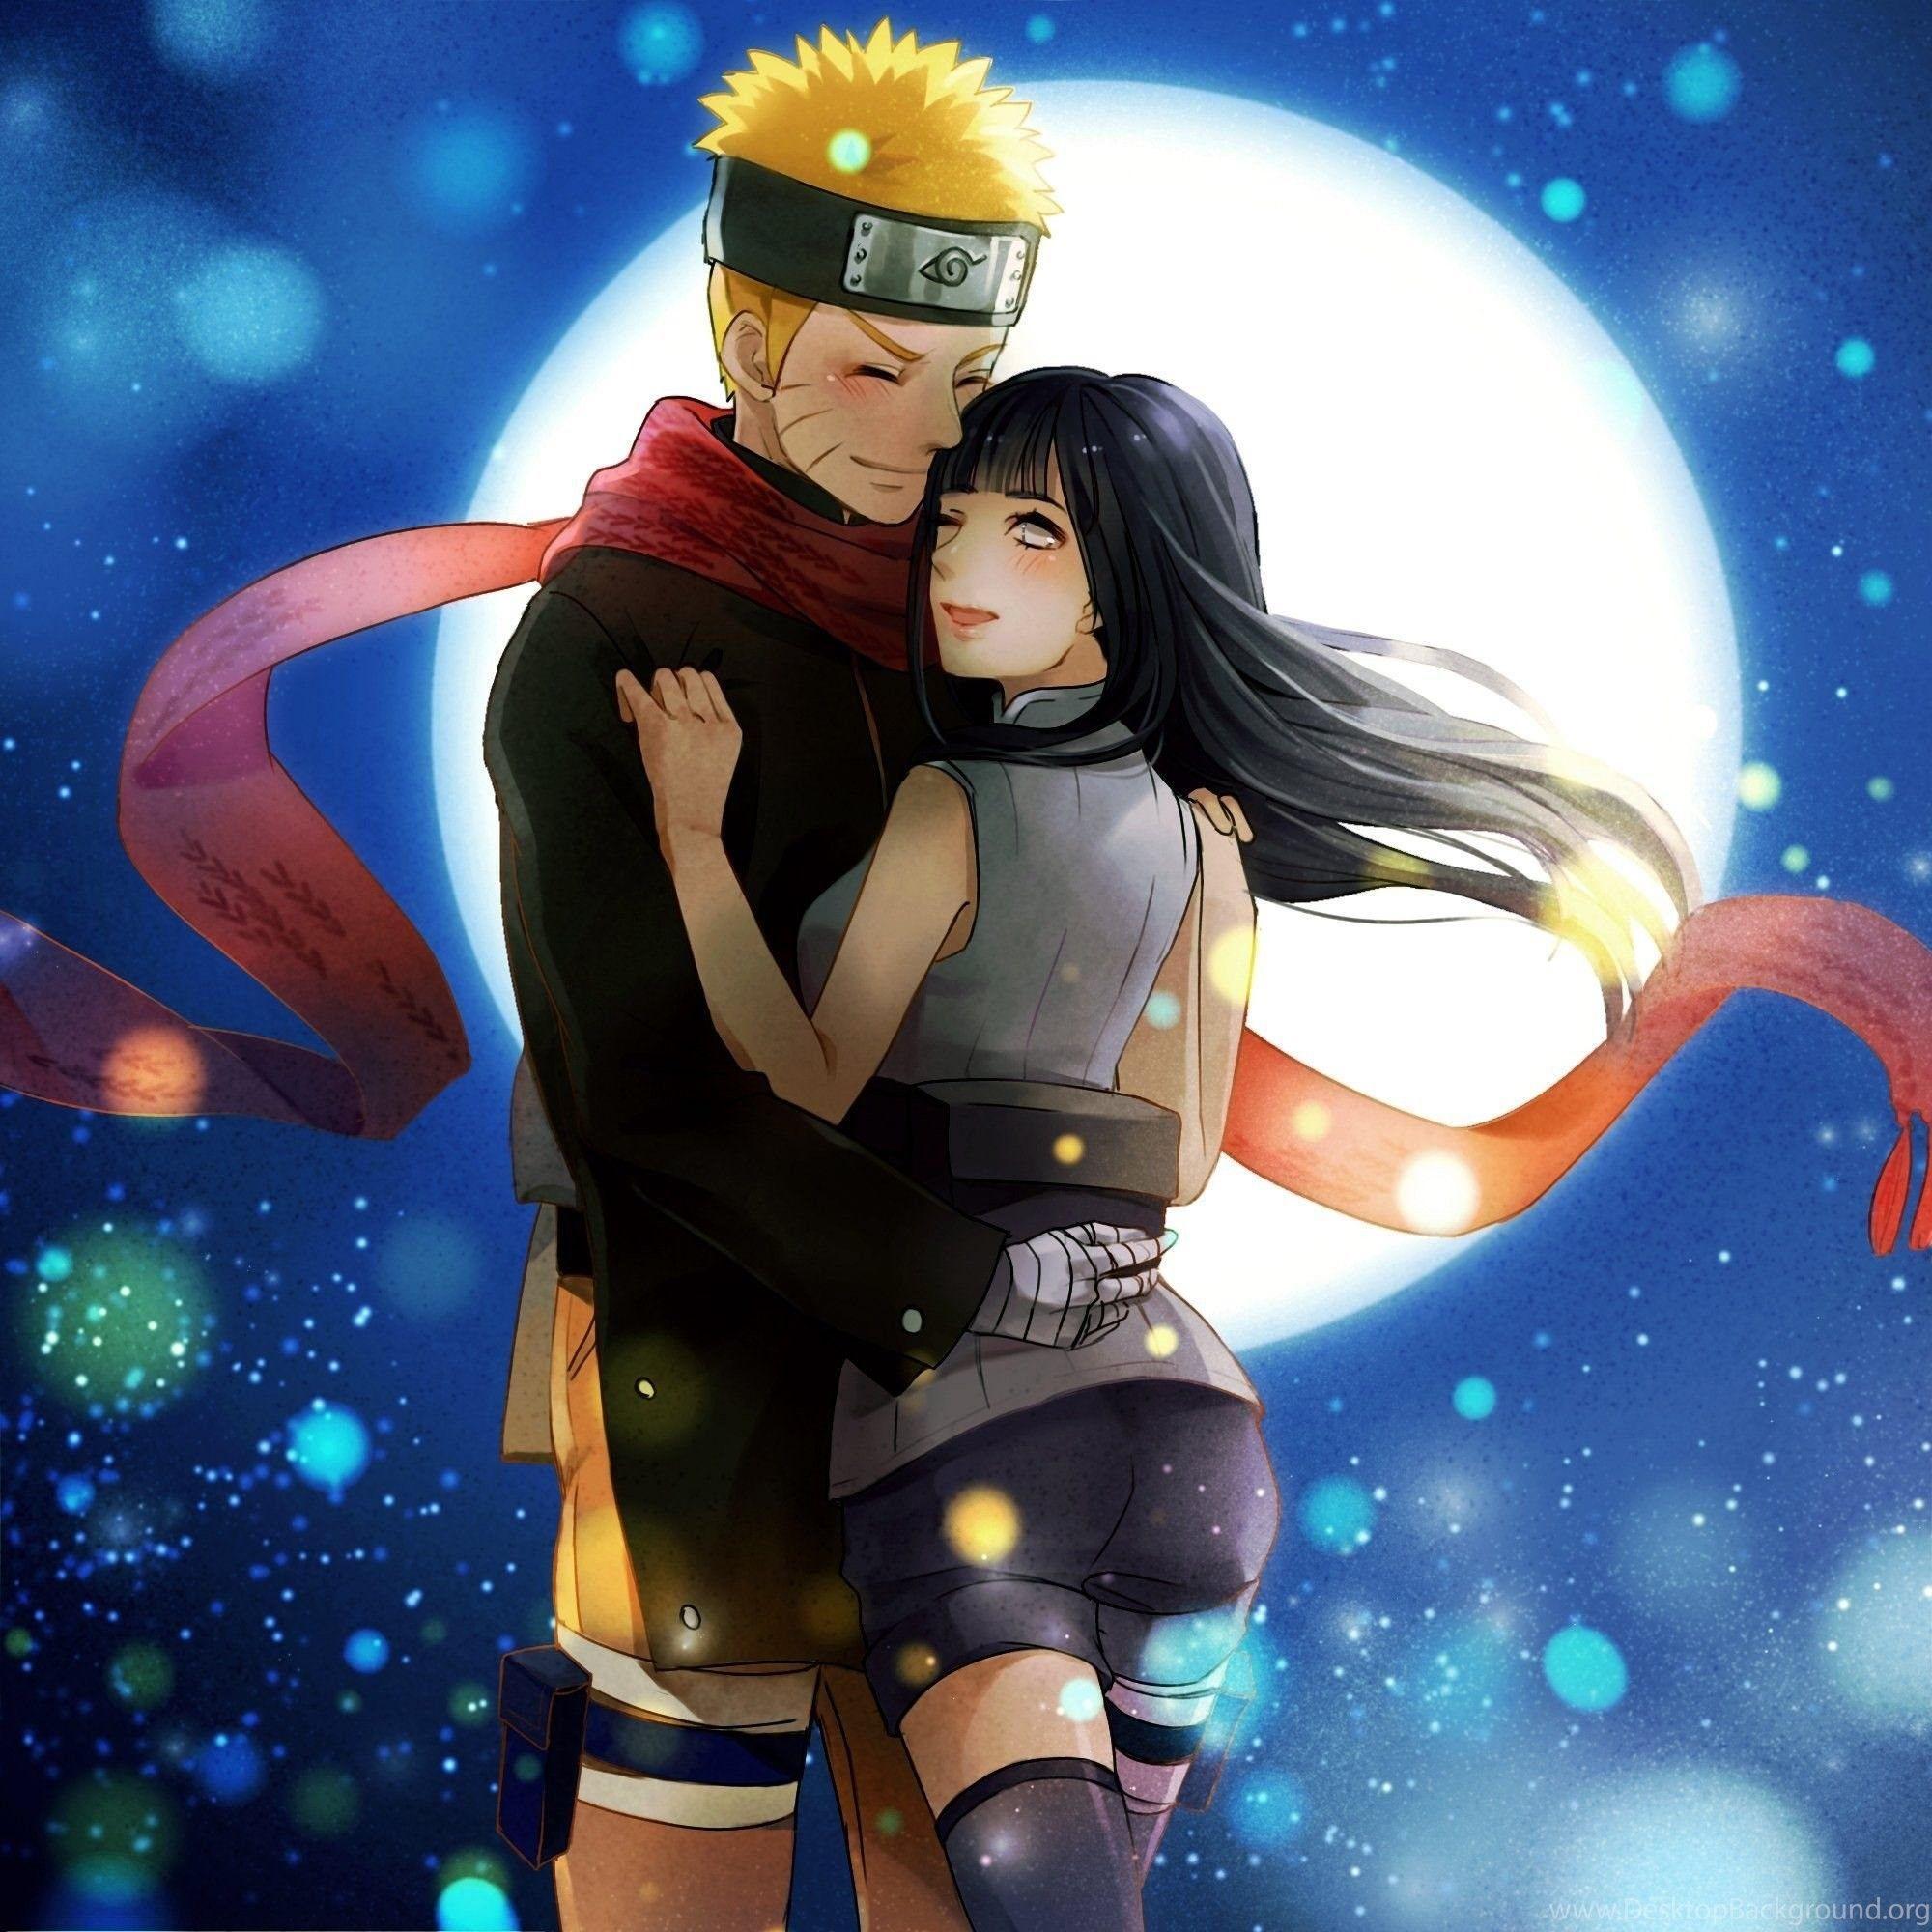 Naruto Love Wallpapers Top Free Naruto Love Backgrounds Wallpaperaccess